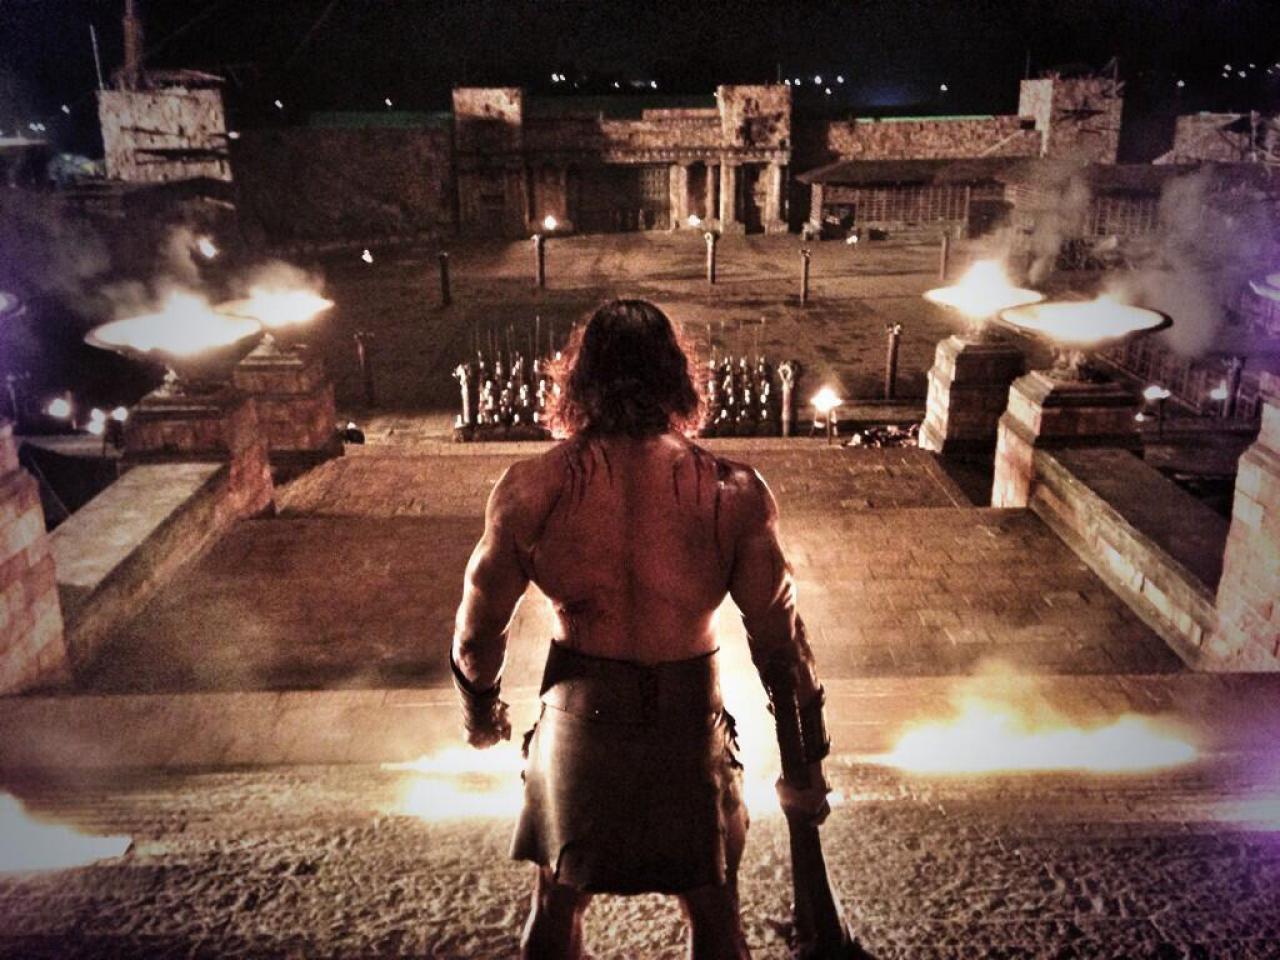 Hercules 2014 The Rock Movie Trailer Release Date